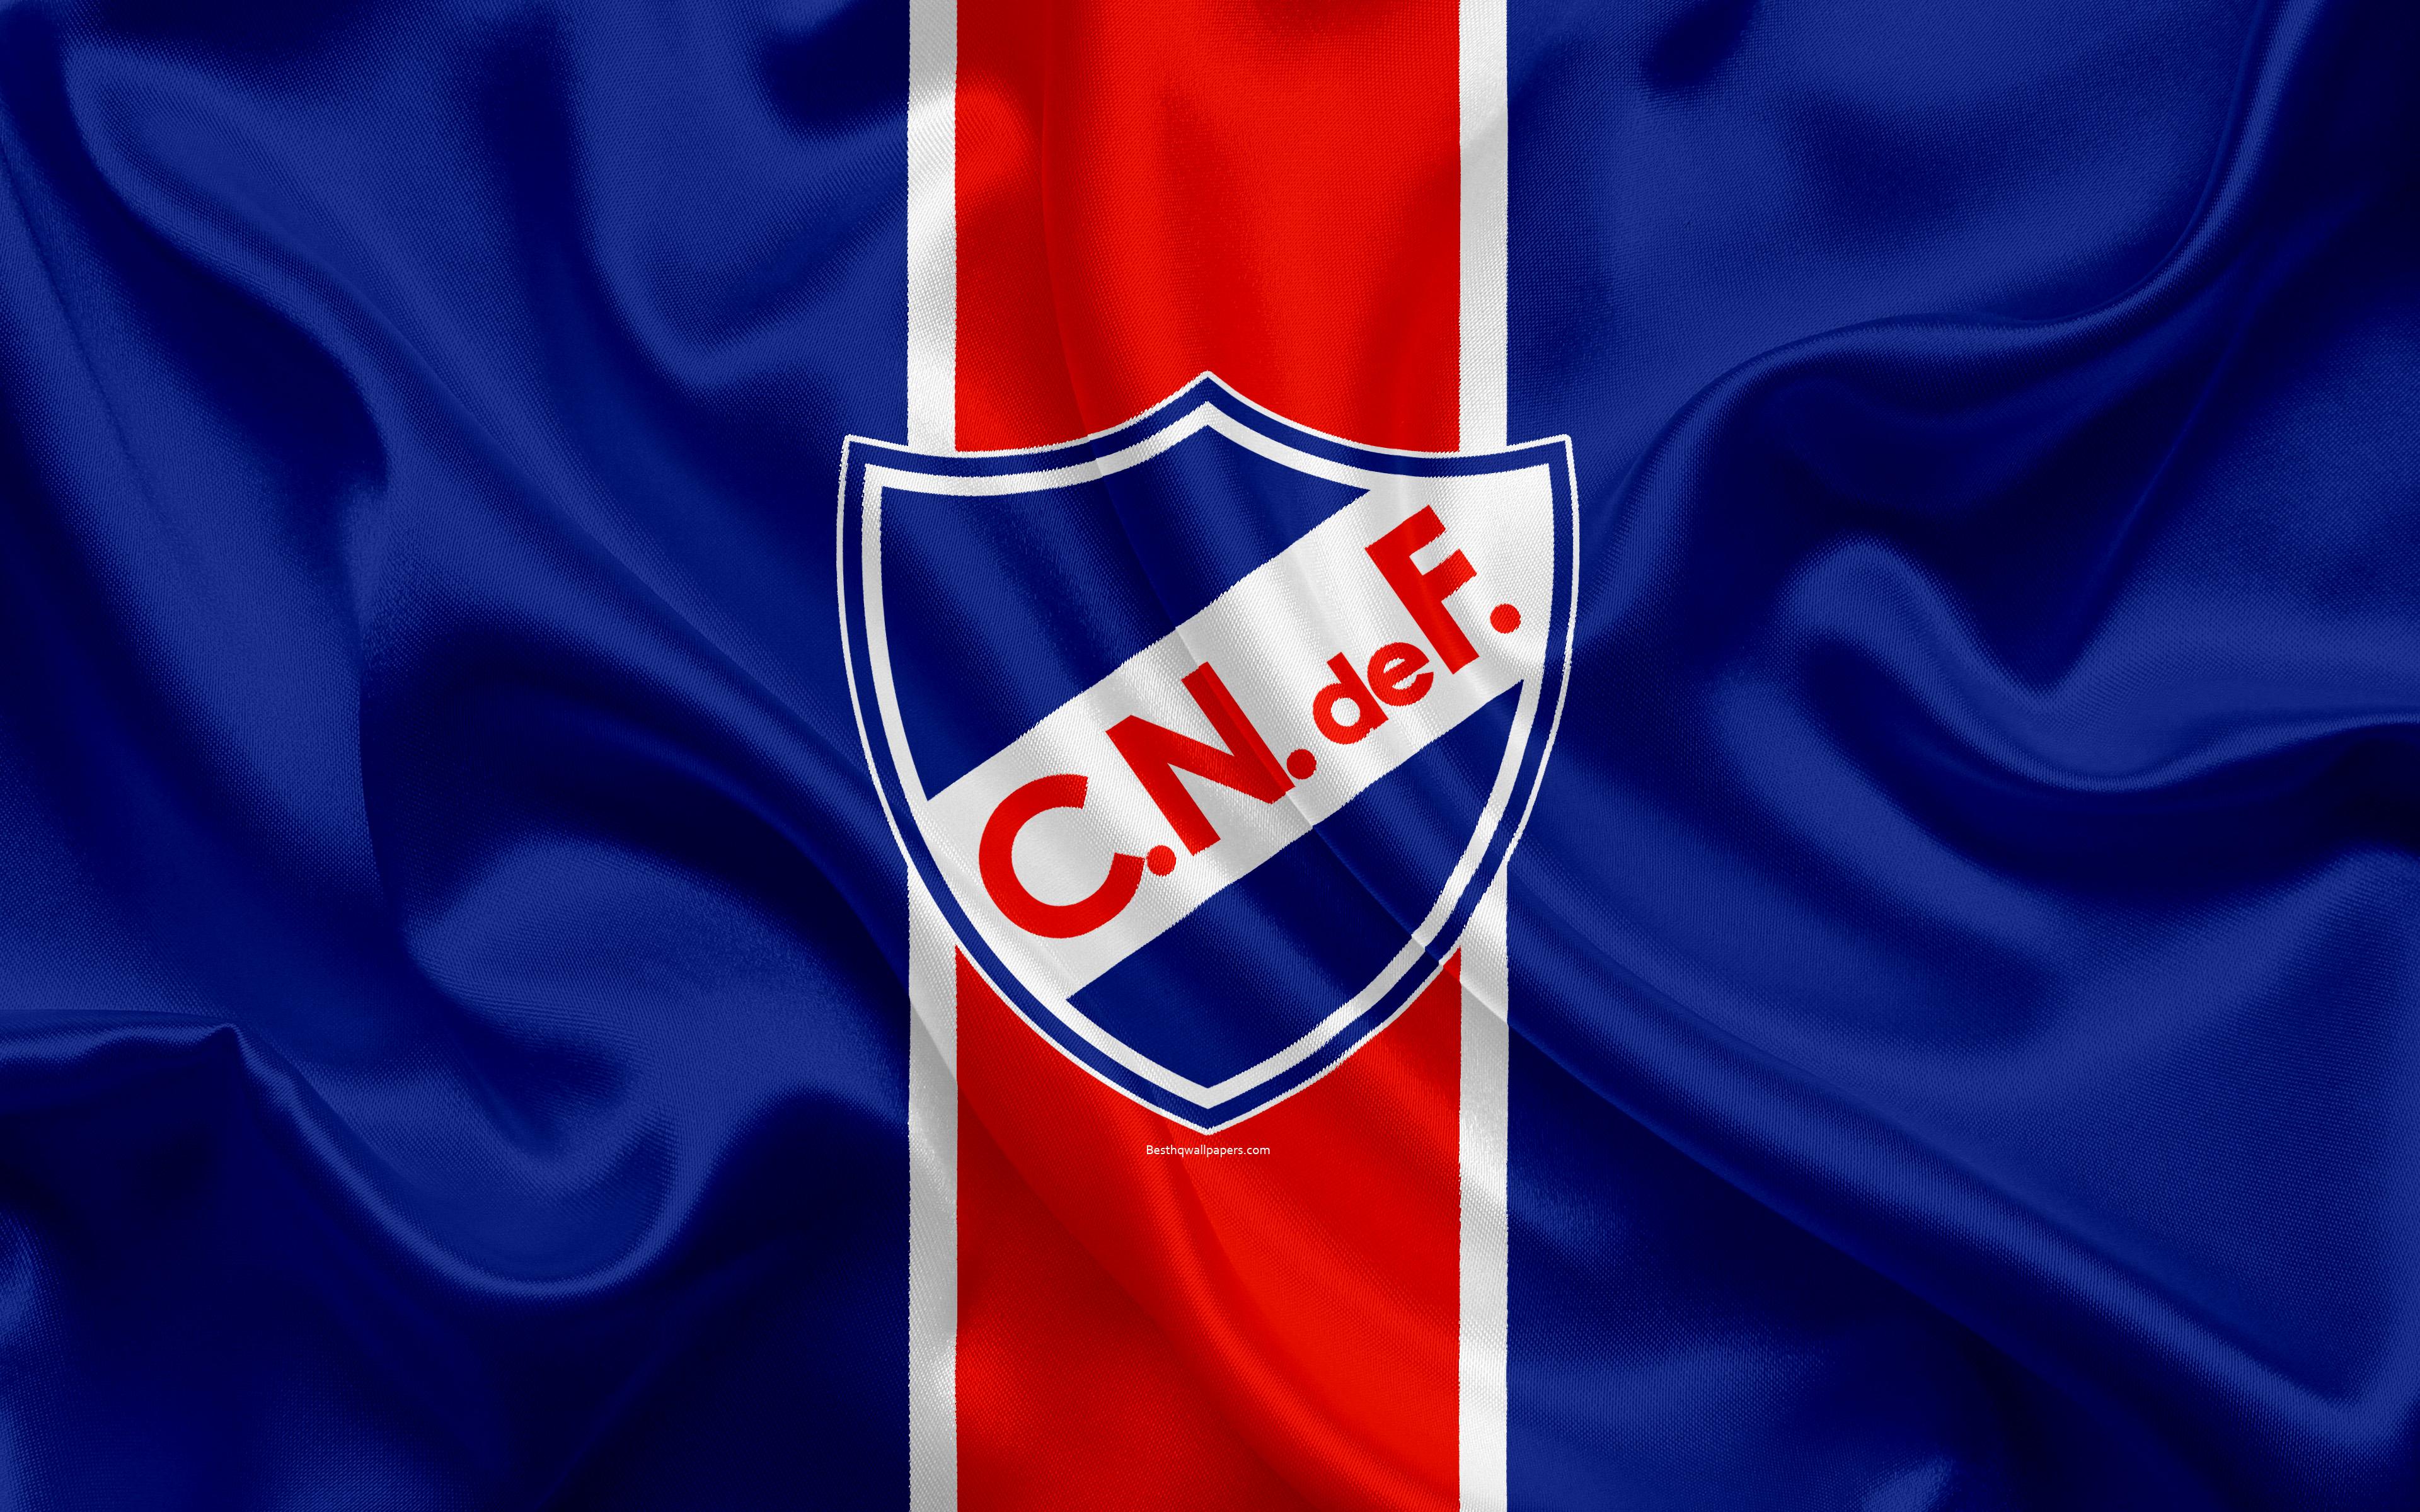 Download wallpapers Club Nacional de Football 4k Uruguayan 3840x2400